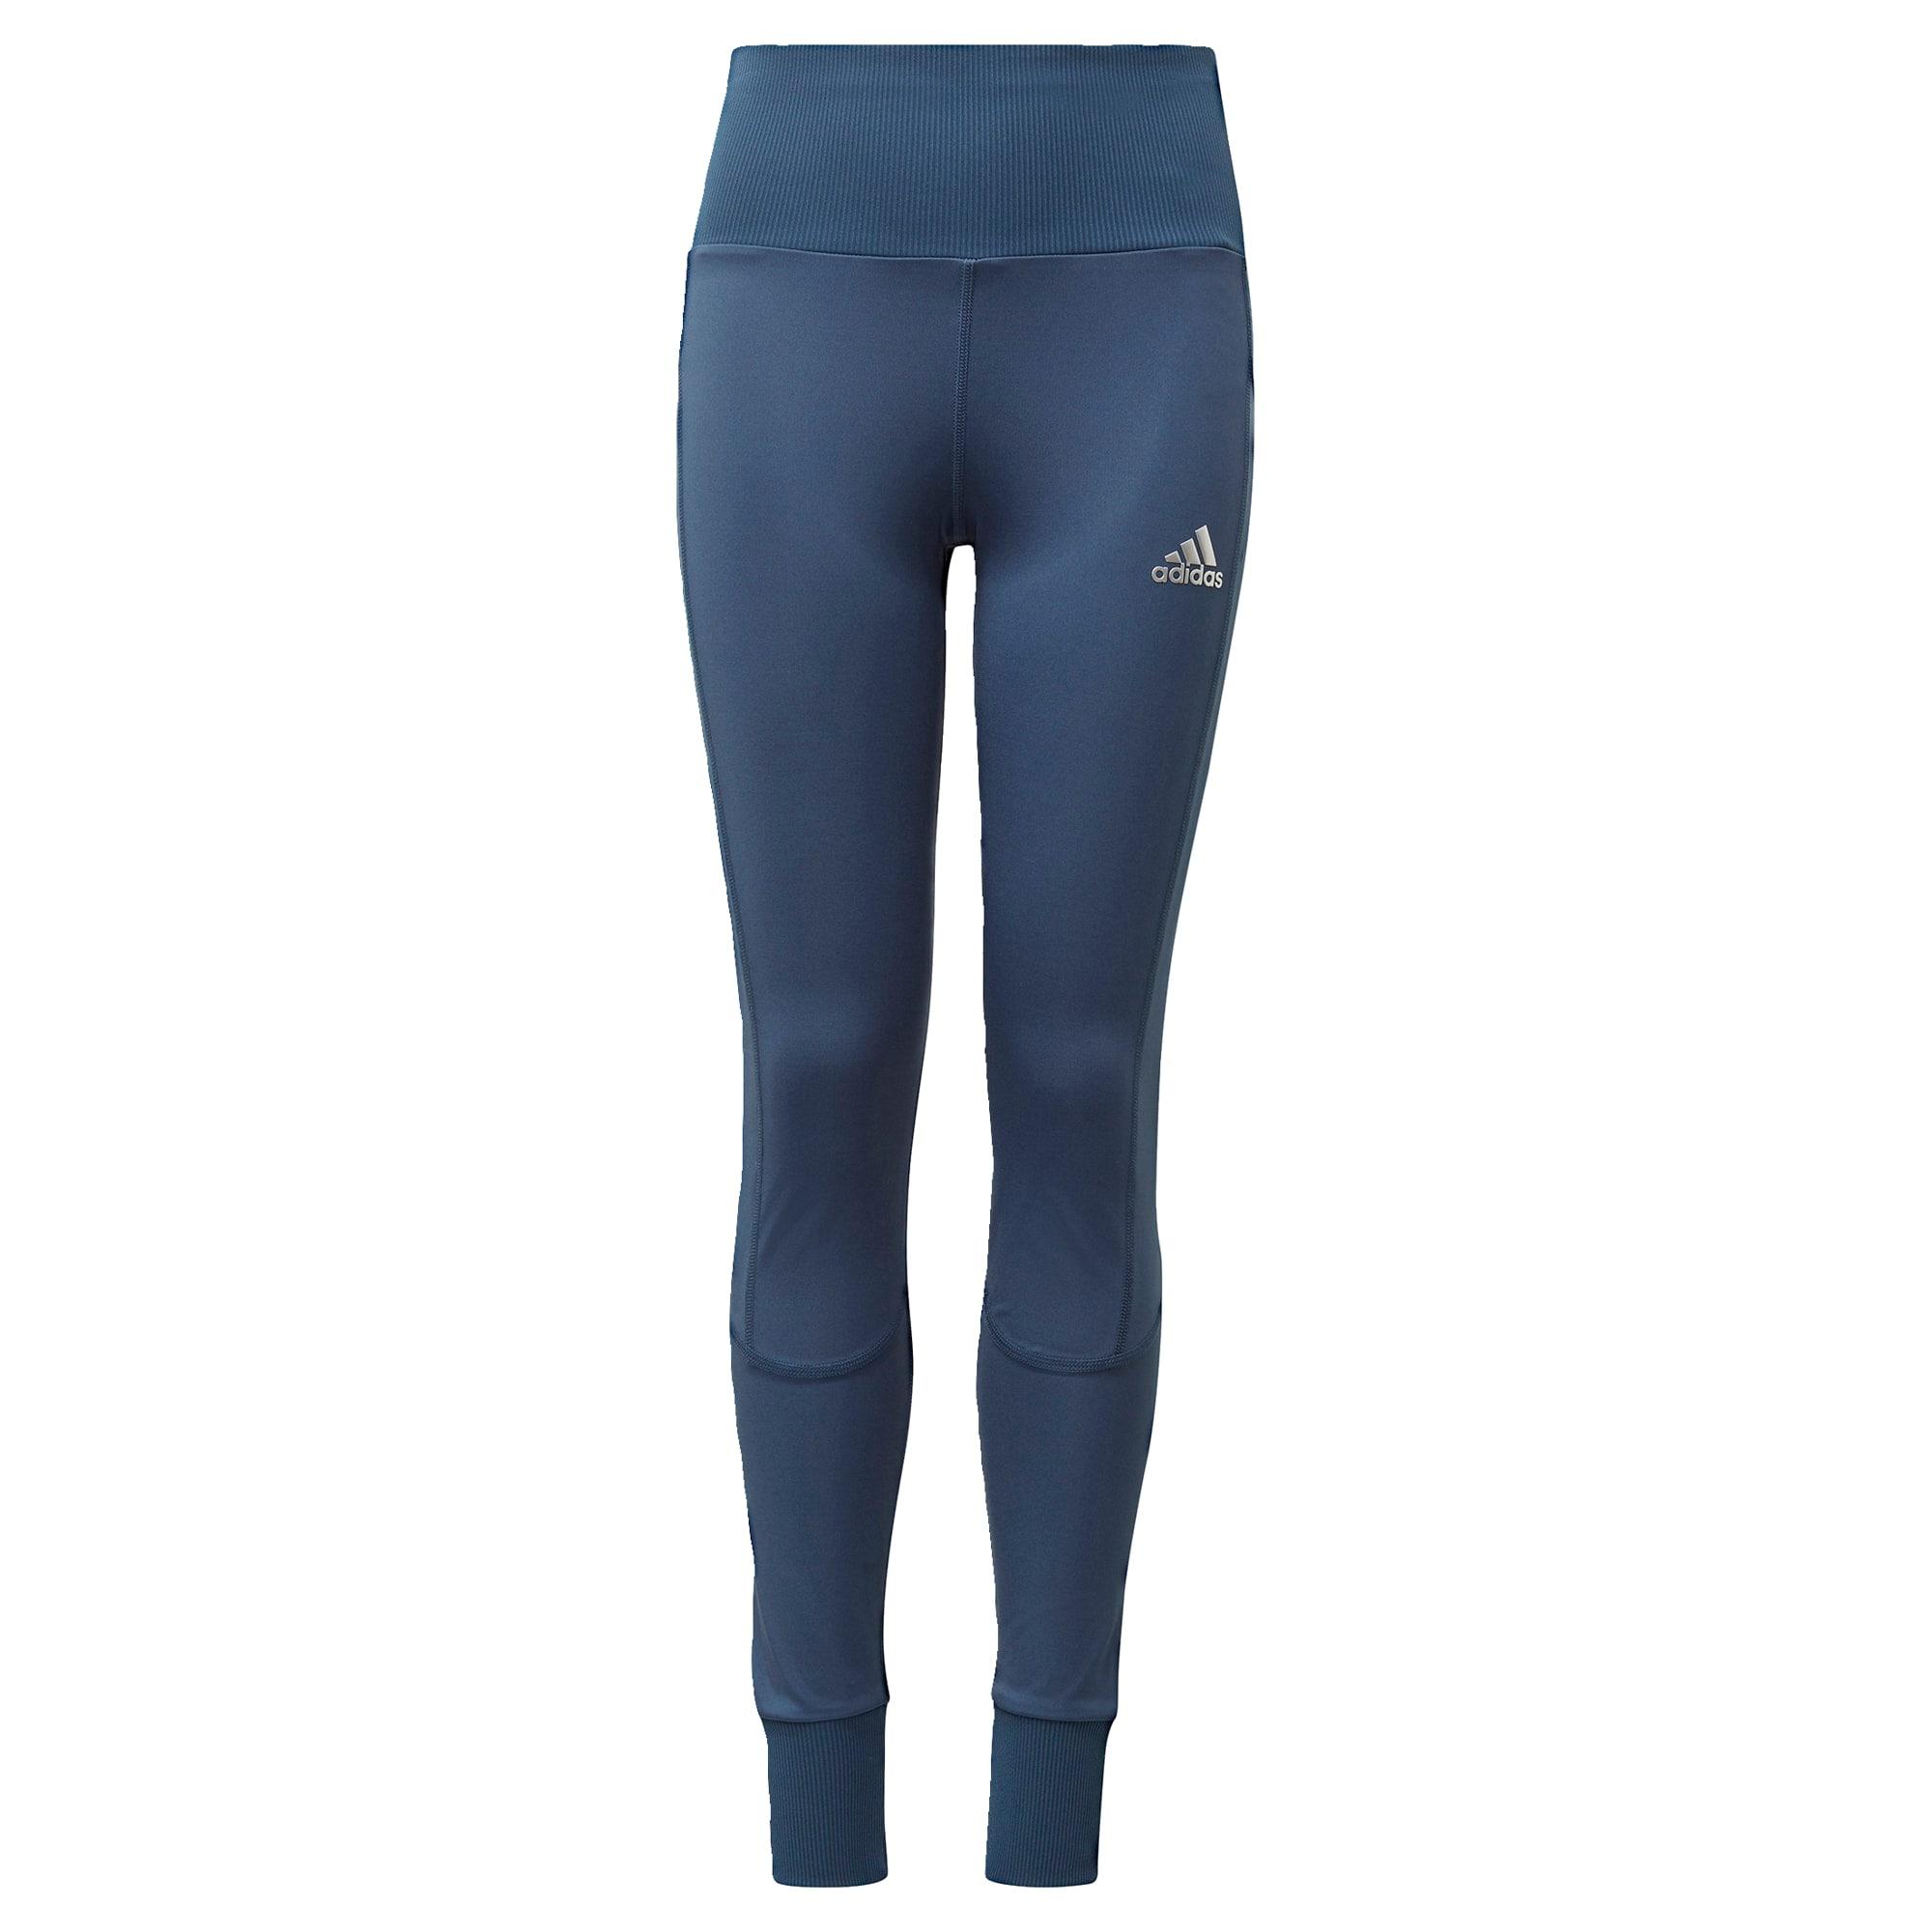 ADIDAS PERFORMANCE Sportinės kelnės 'Comfort Workout' mėlyna / balta